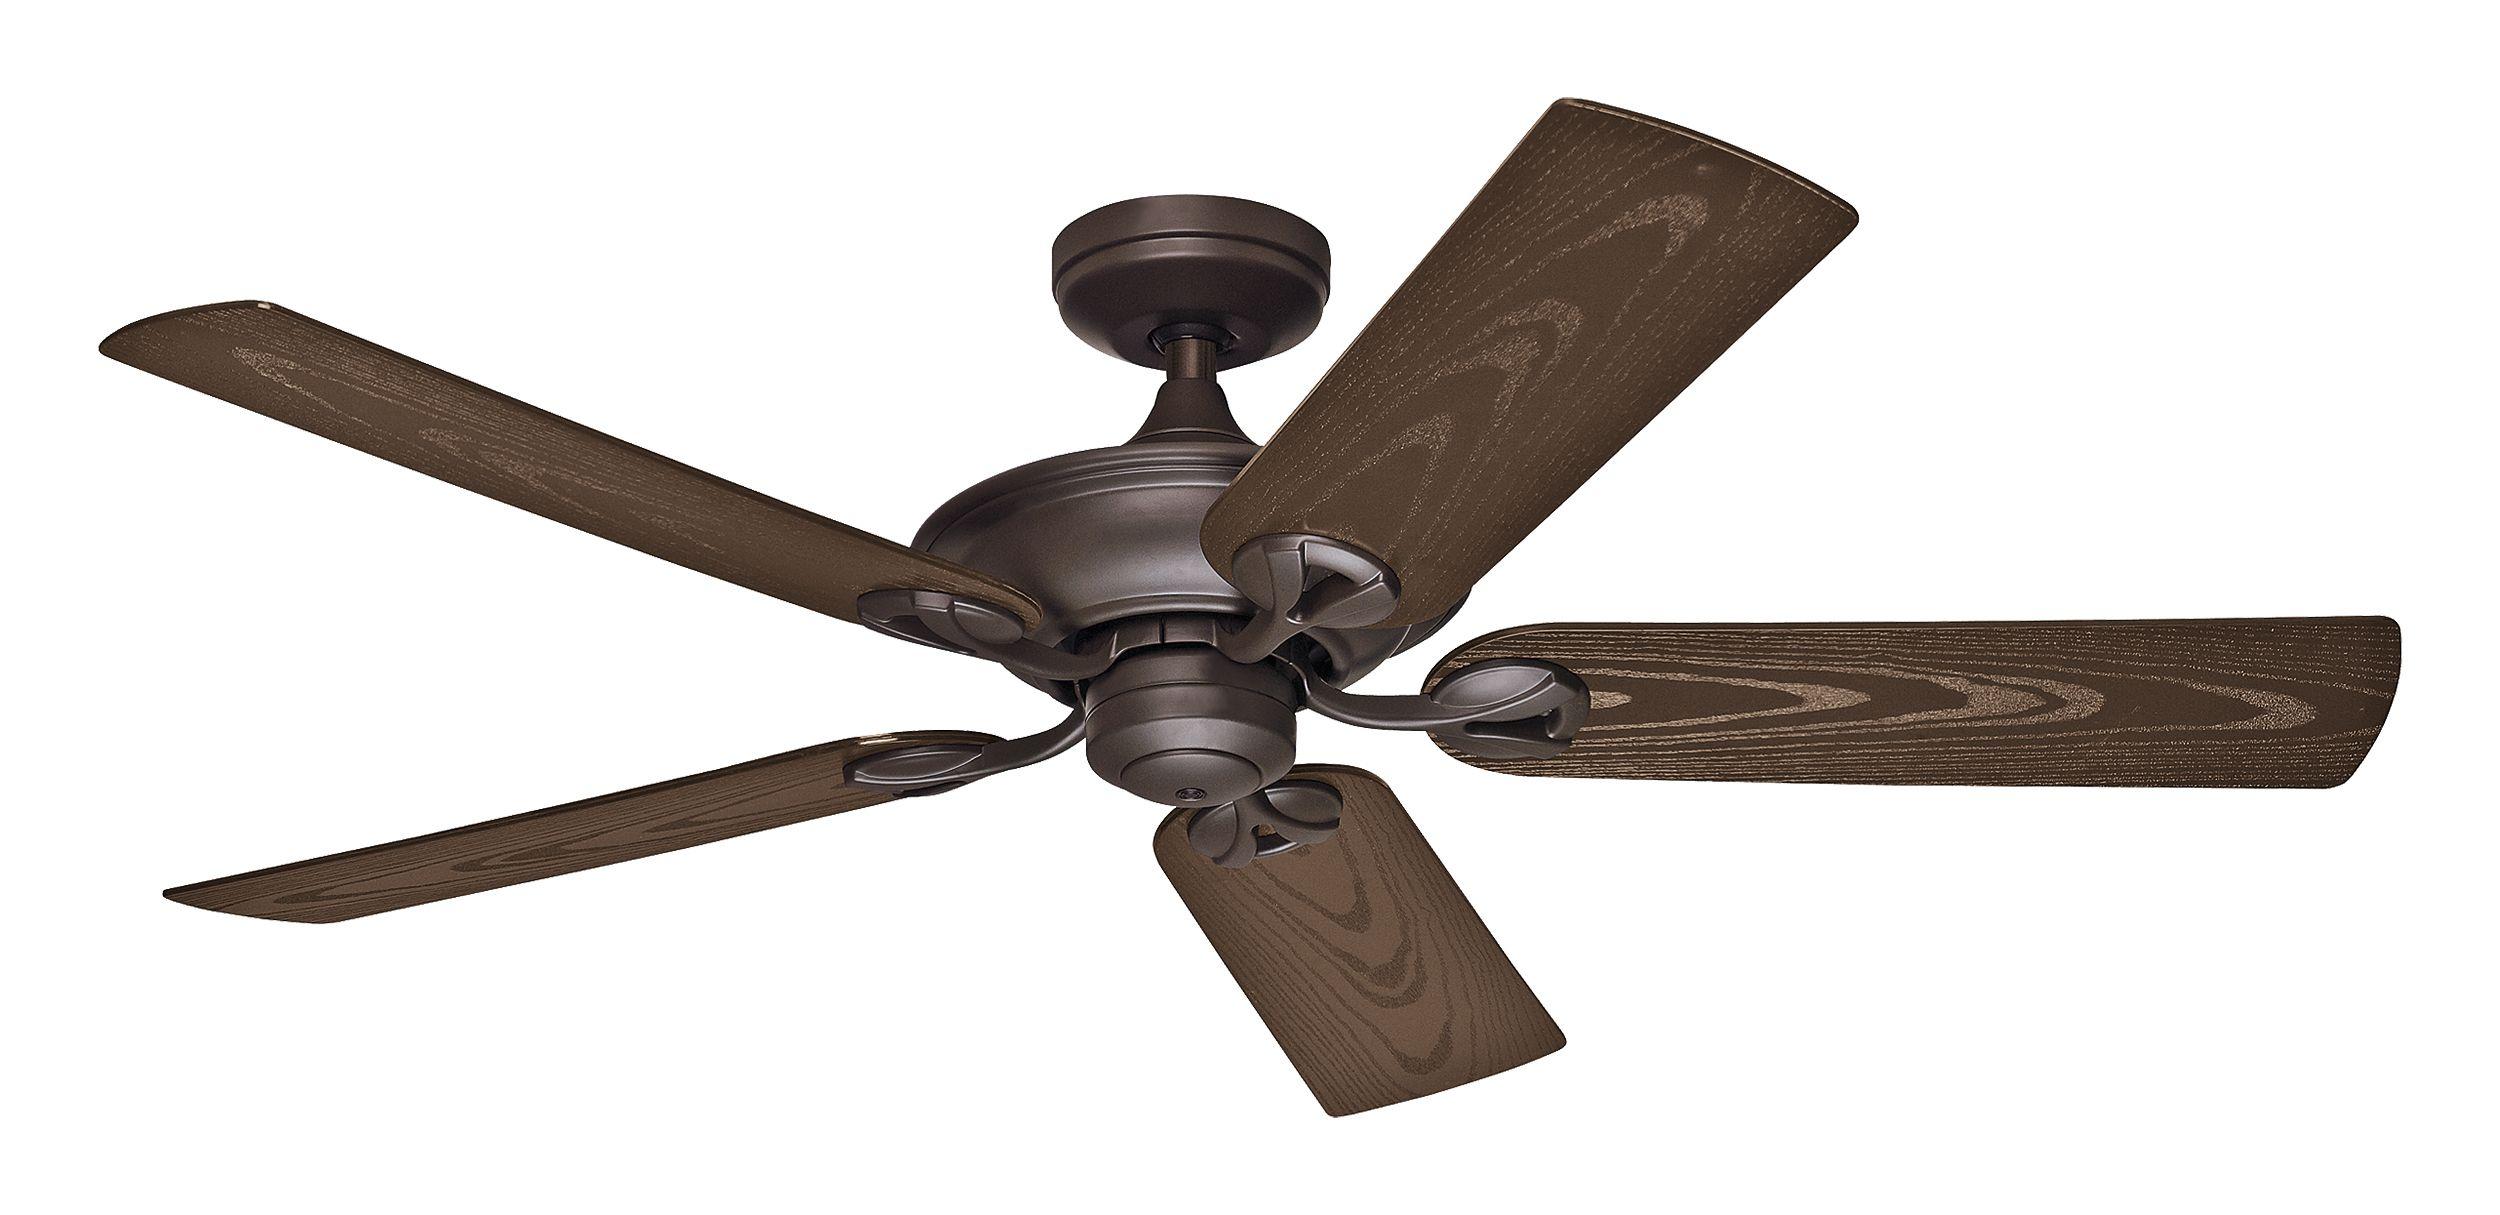 Hunter Outdoor Ceiling Fan Maribel Bronze 132cm 52 Home Commercial Heaters Ventilation Ceiling Fans Uk